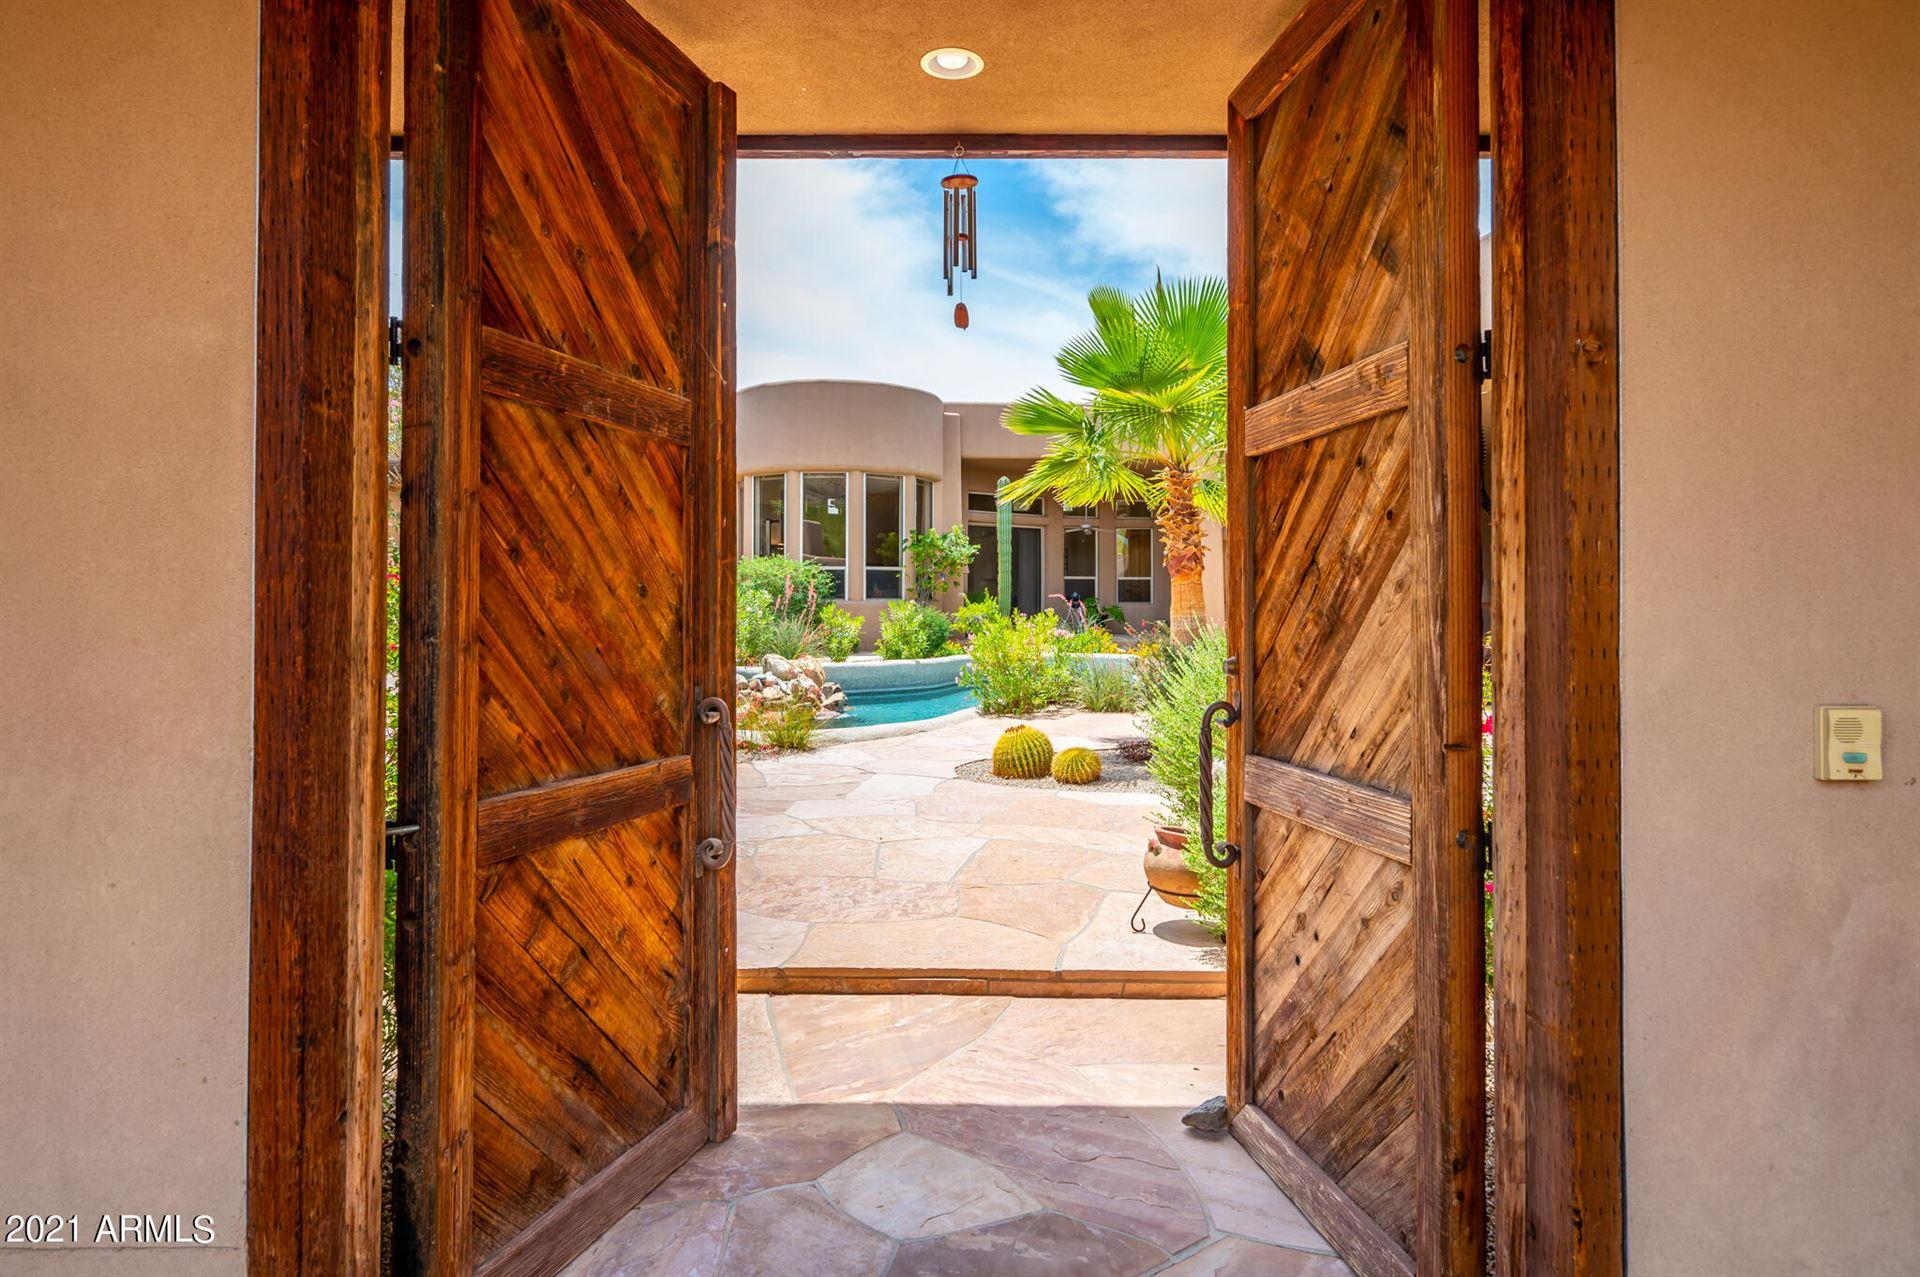 Photo of 6035 E LOS REALES Drive, Carefree, AZ 85377 (MLS # 6238988)